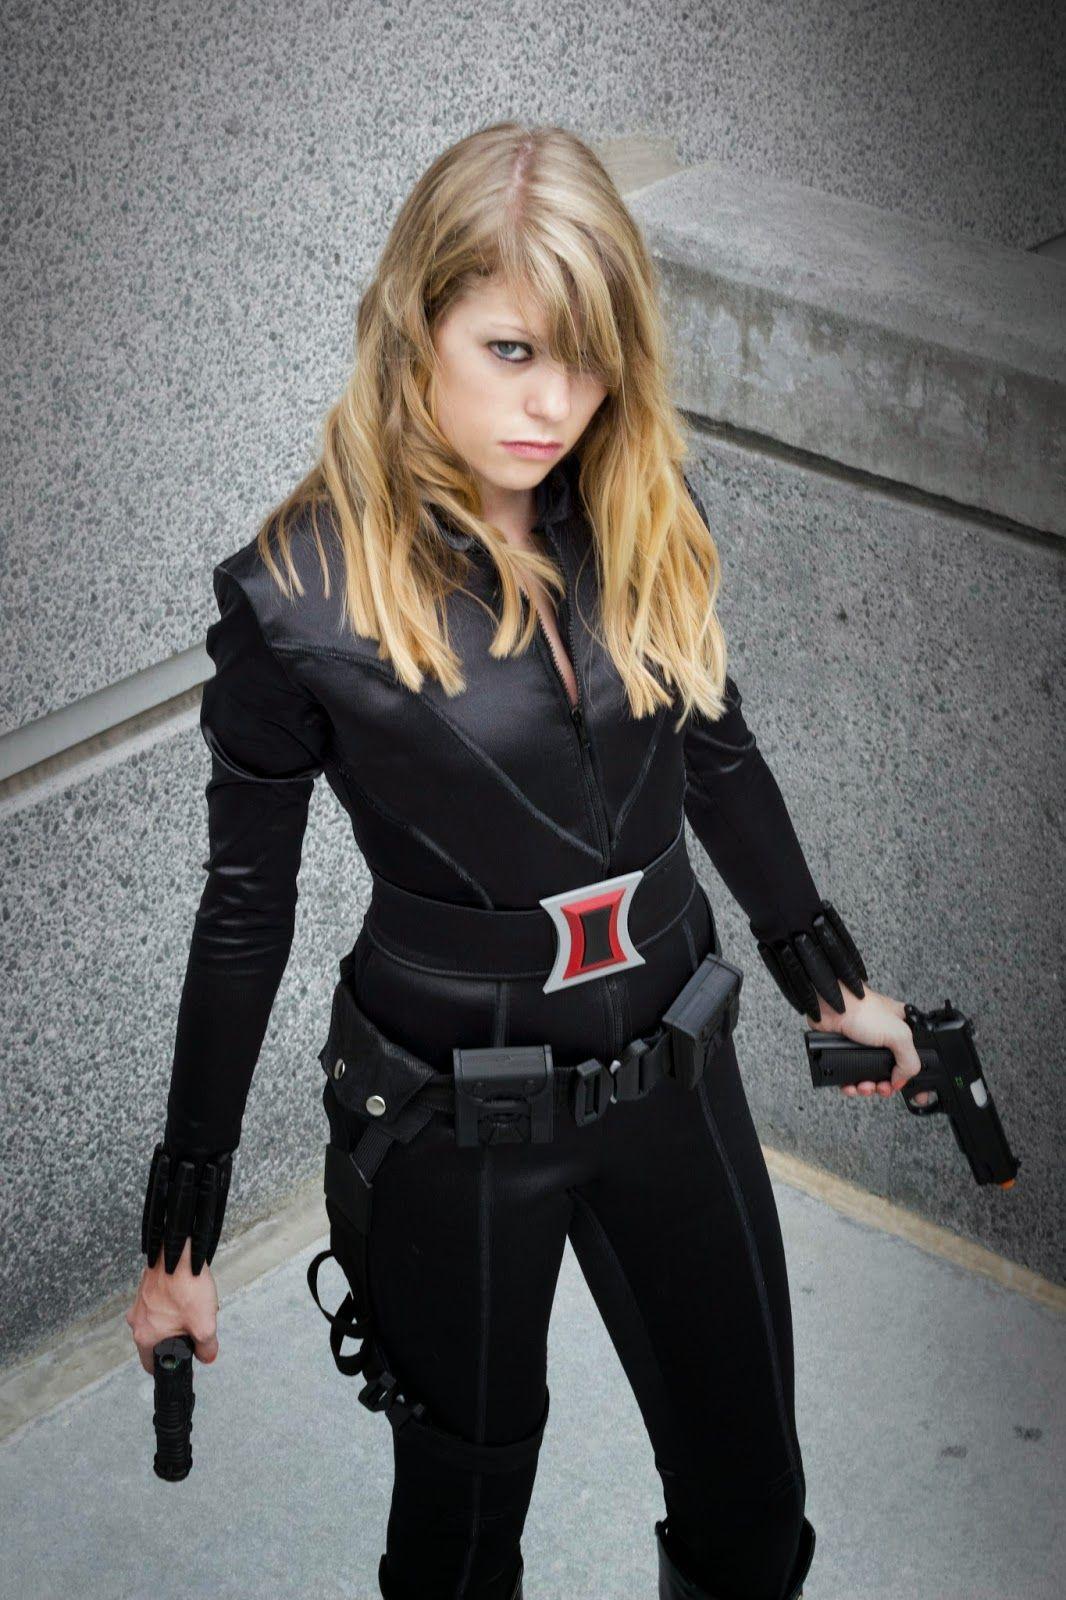 Black Widow Age Of Ultron Cosplay Google Search Black